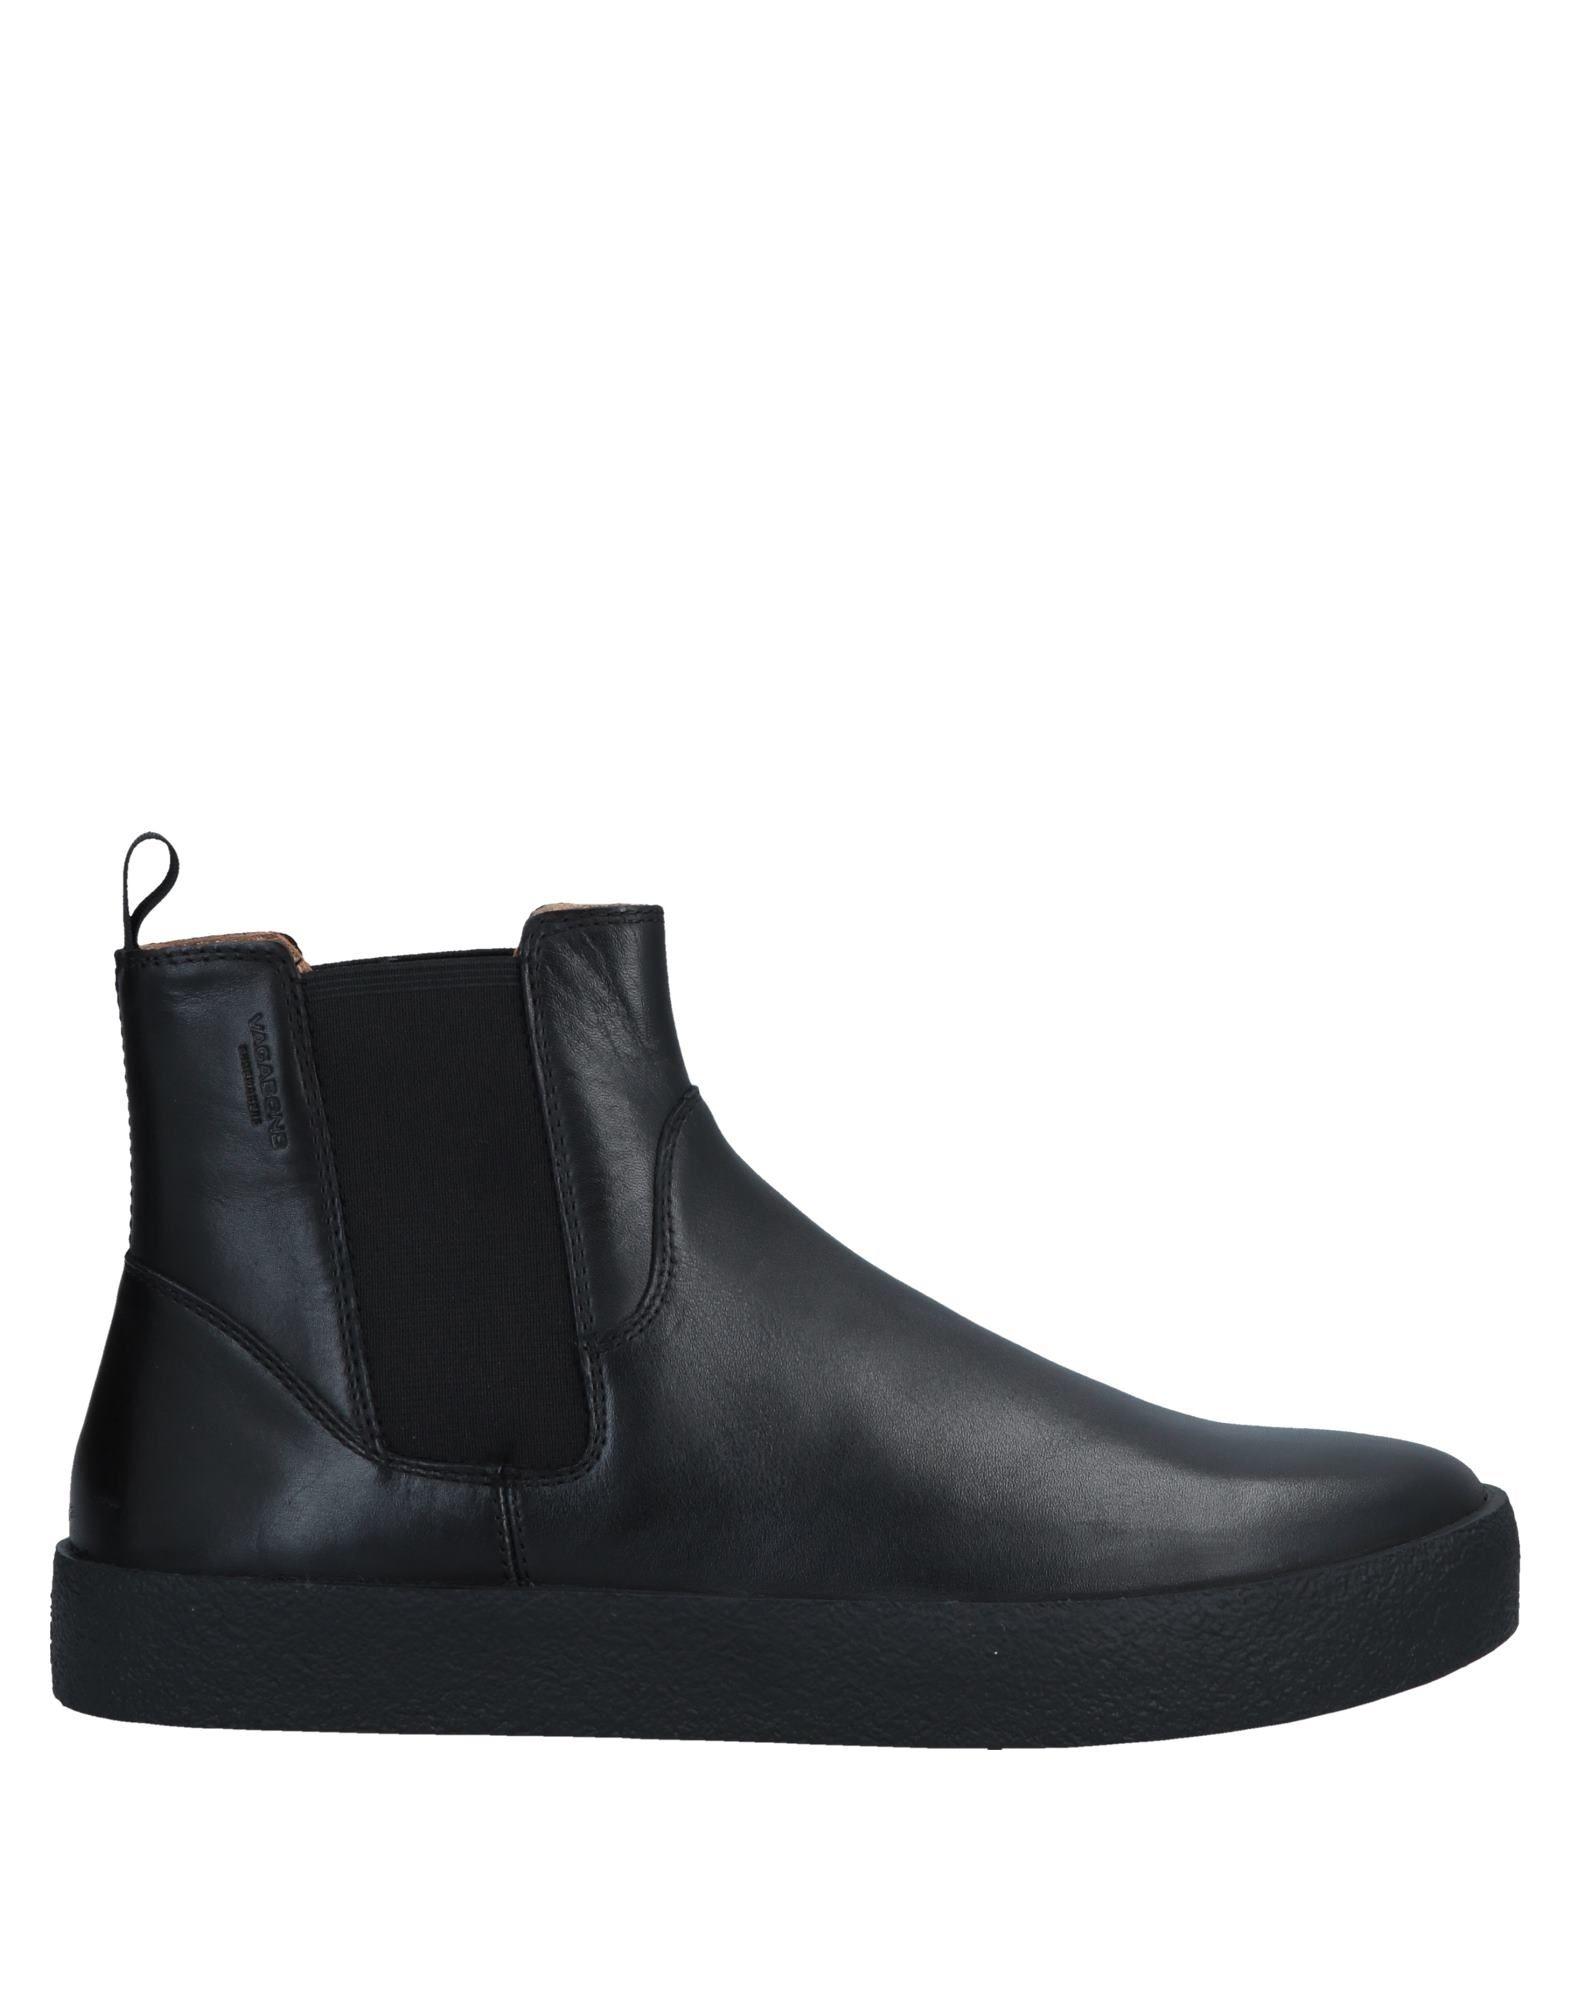 Negro Botín Vagabond Zapatosmakers Hombre Hombre Hombre - Botines Vagabond Zapatosmakers modelo más vendido de la marca 6316dc